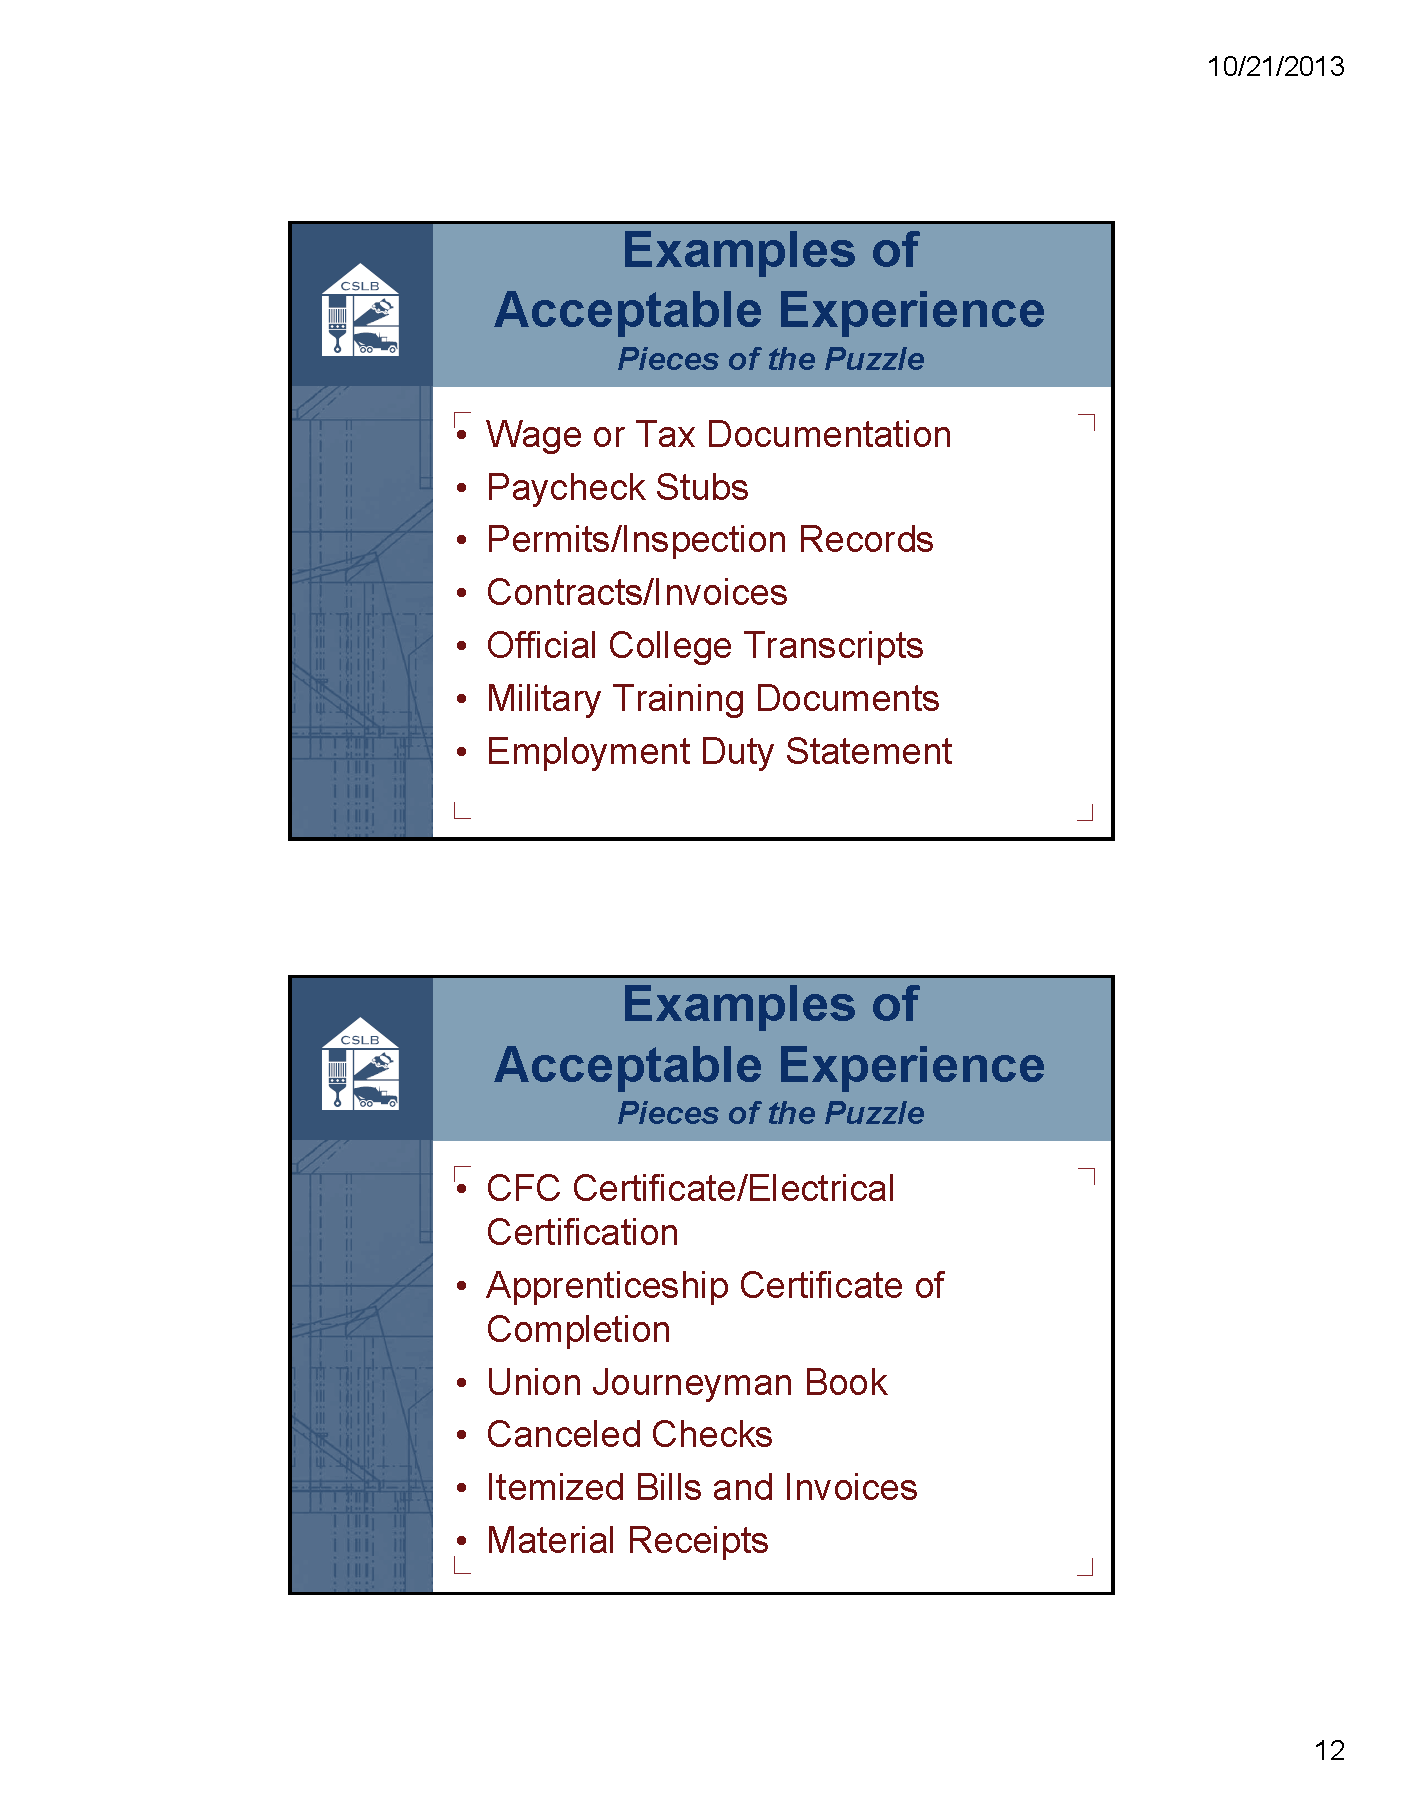 Cslb Qualifying Experience Part 3 Contractors License Guru